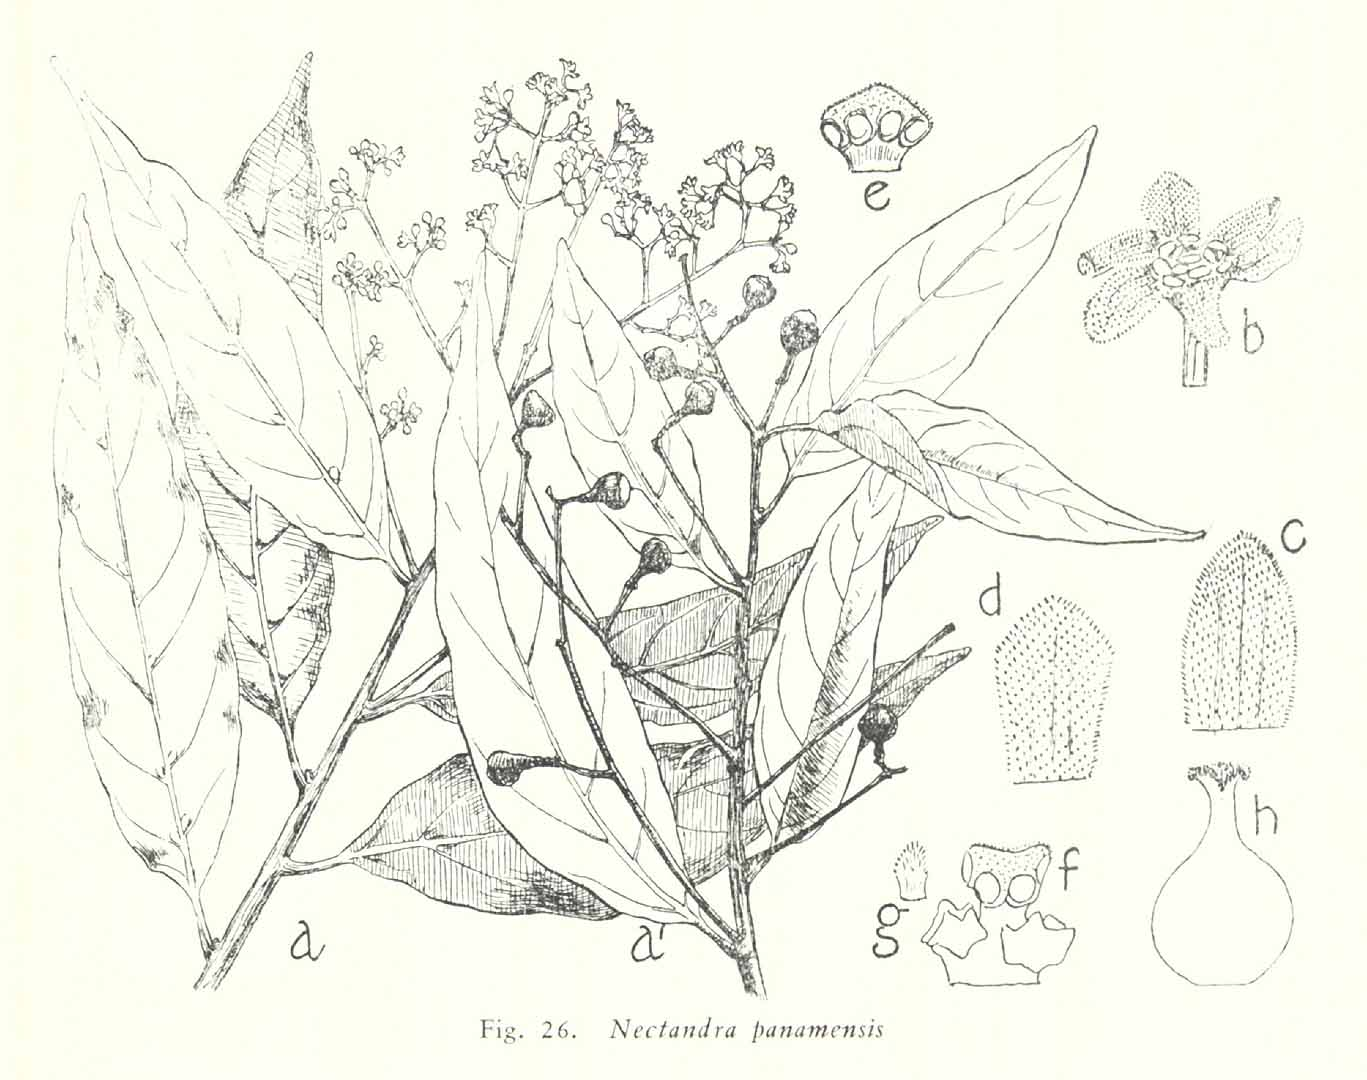 Nectandra turbacensis